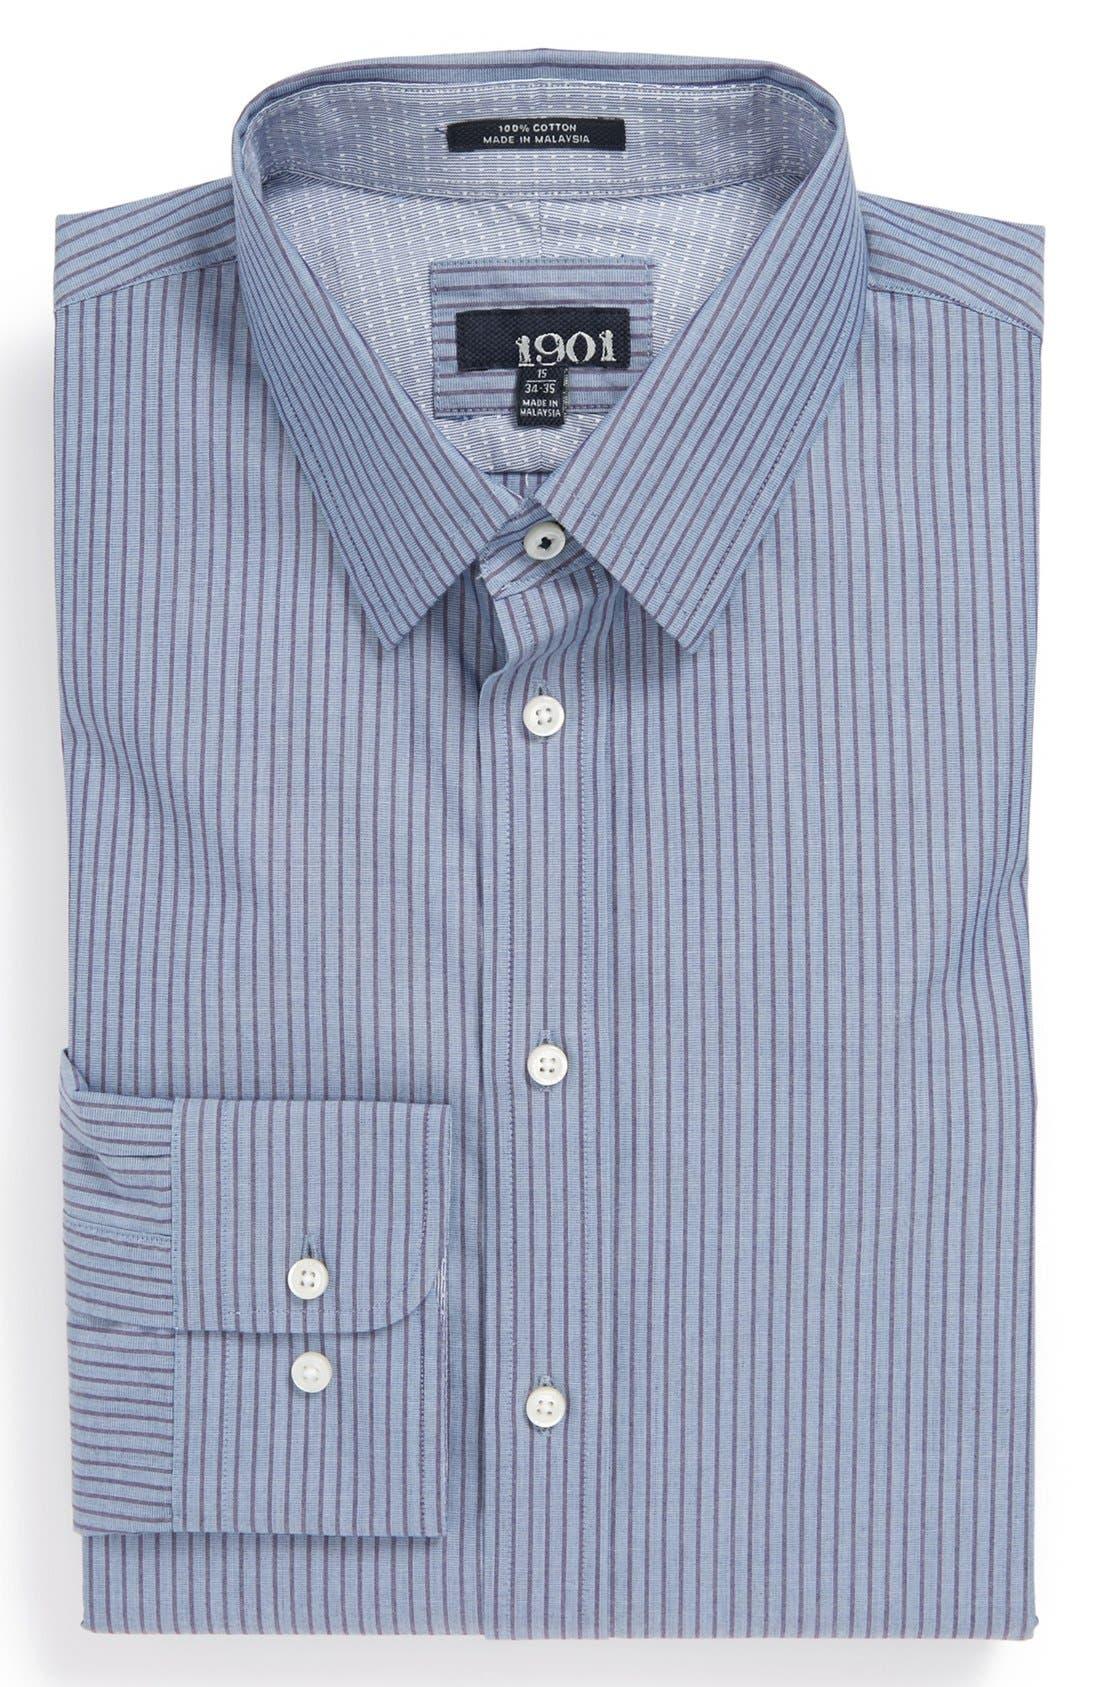 Alternate Image 1 Selected - 1901 Trim Fit Stripe Dress Shirt